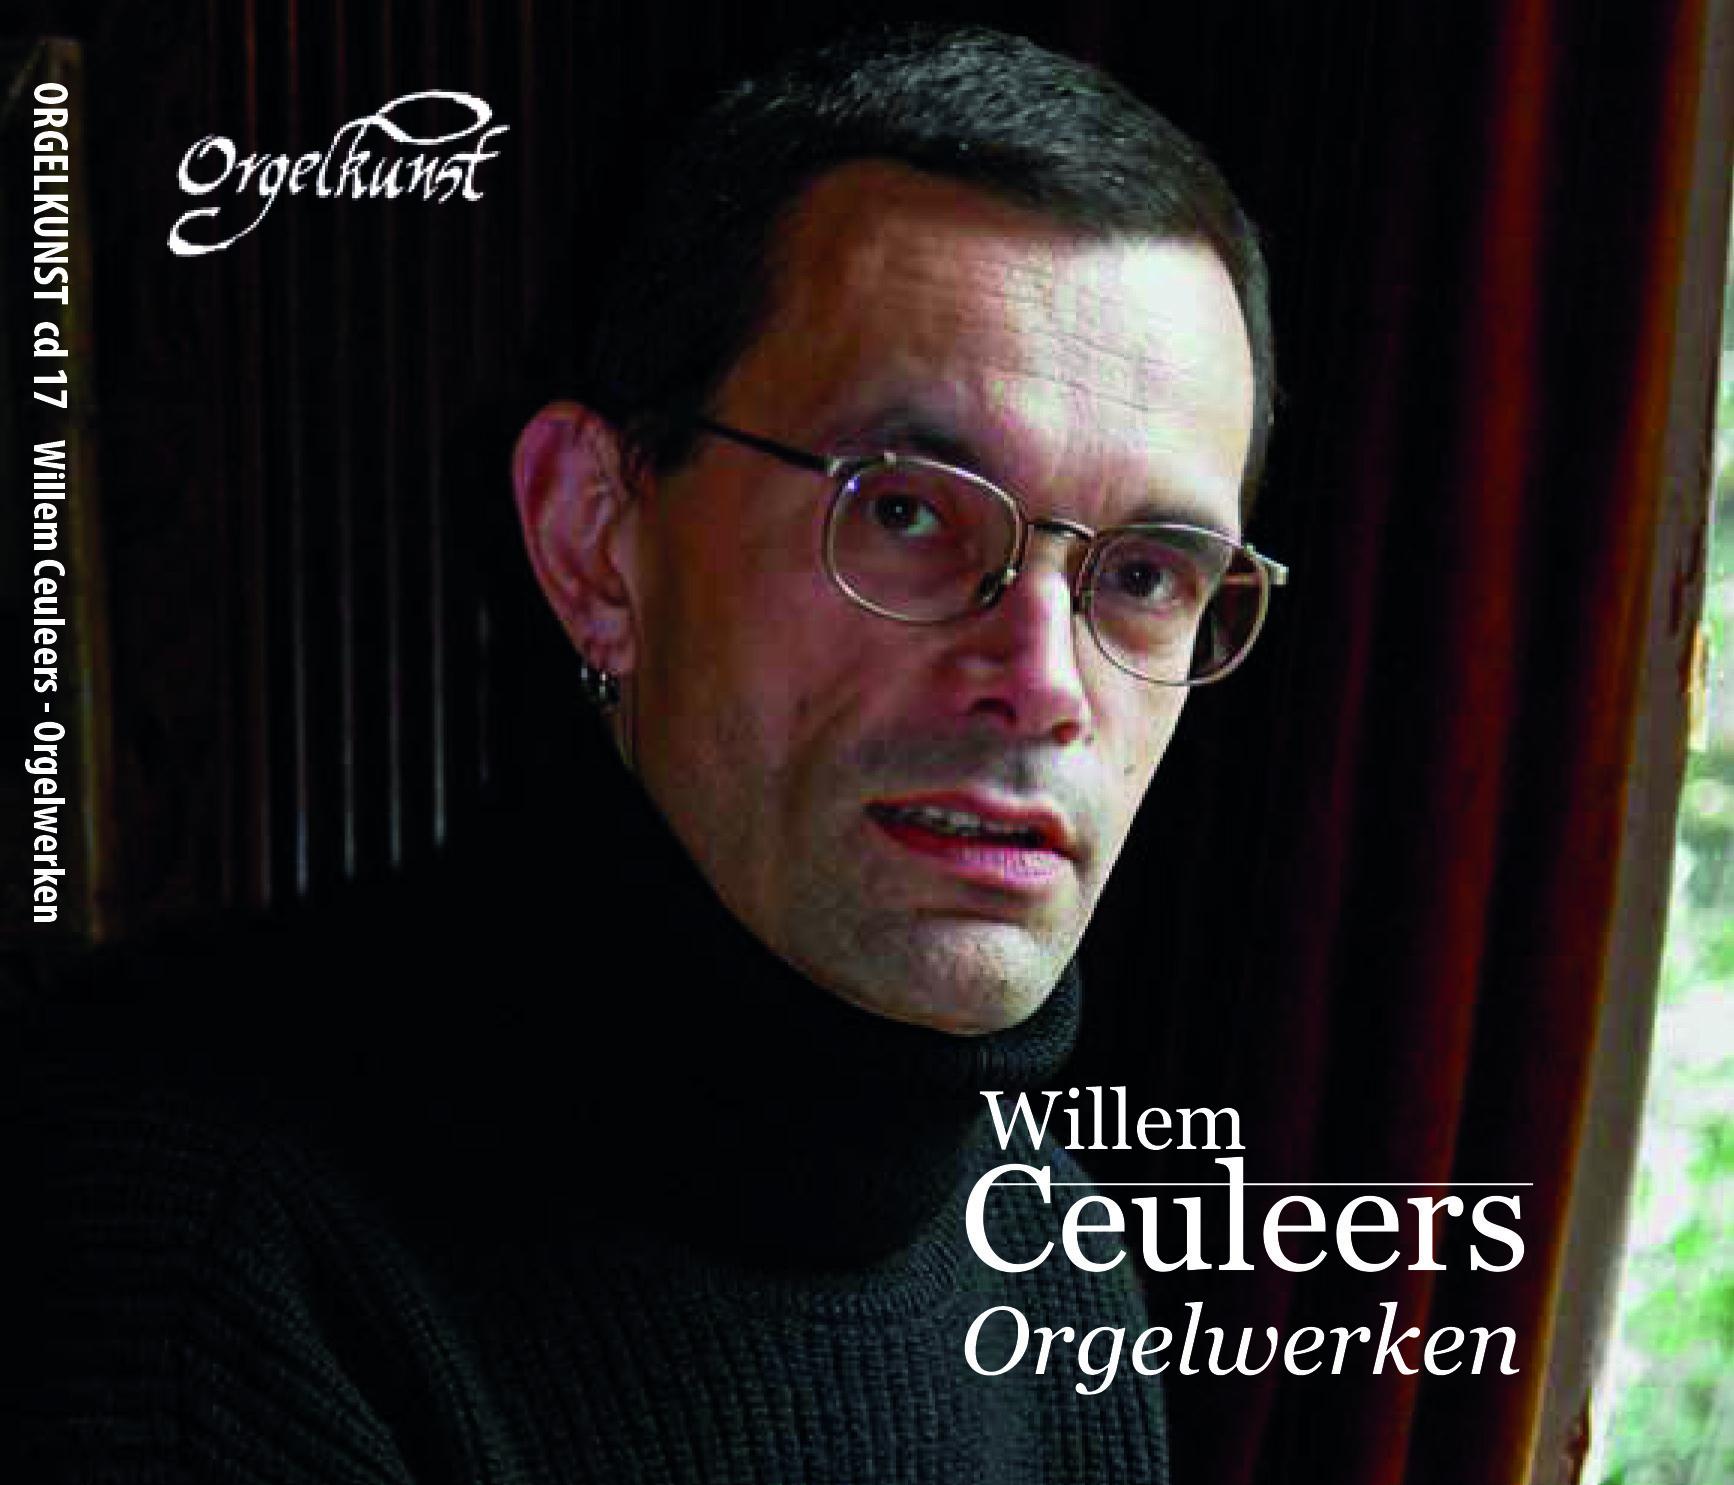 CD 17 | Orgelwerken van Willem Ceuleers